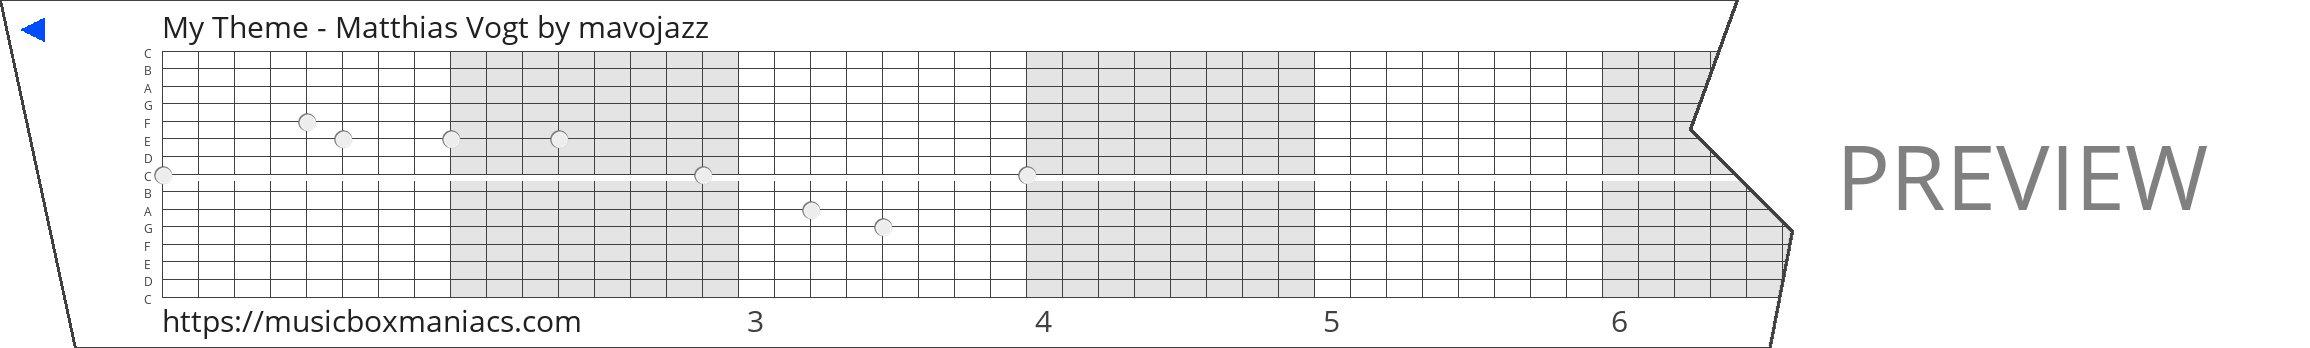 My Theme - Matthias Vogt 15 note music box paper strip